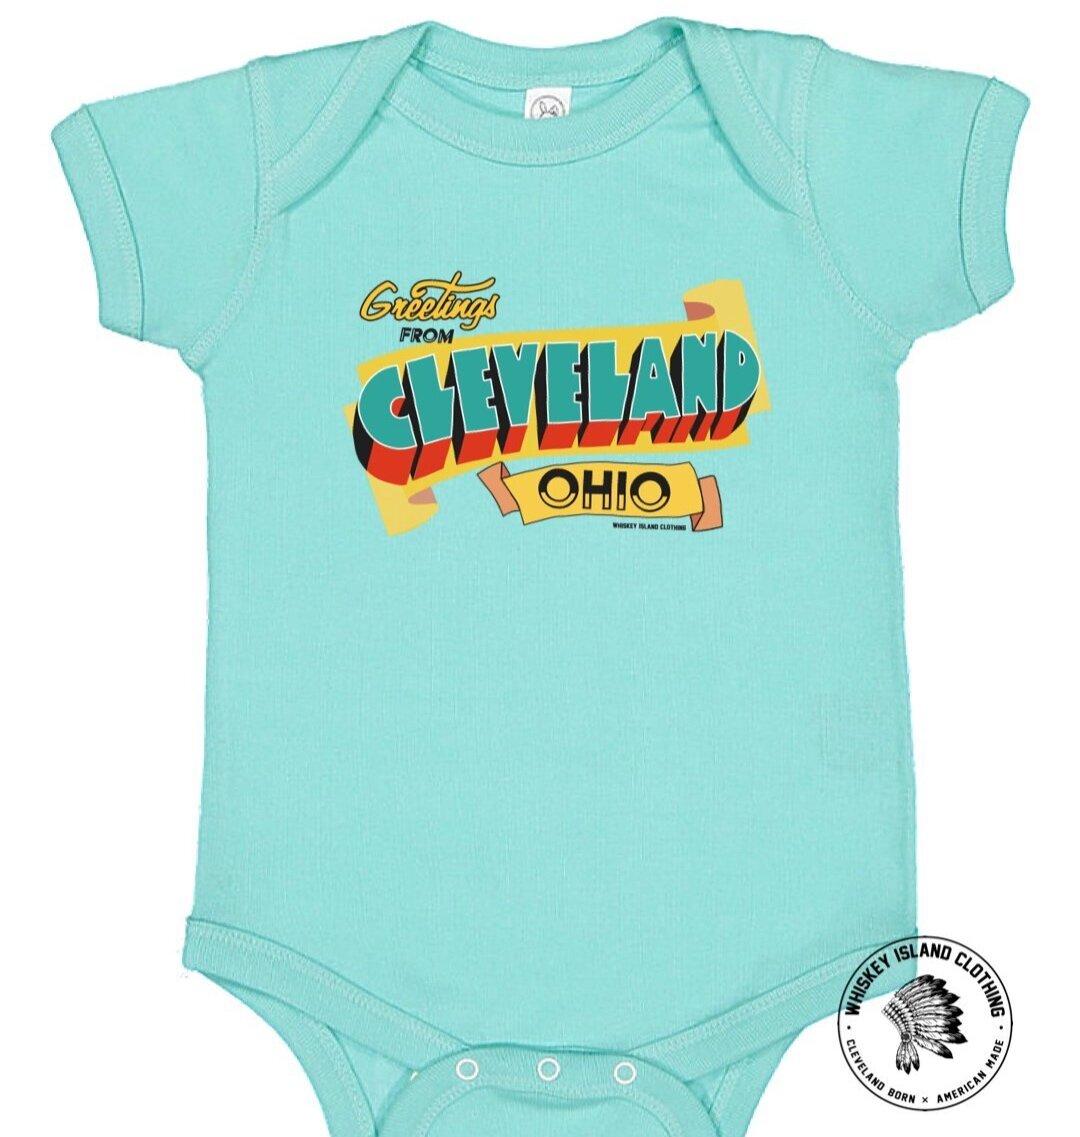 Whiskey Island Clothing baby onsie, $15